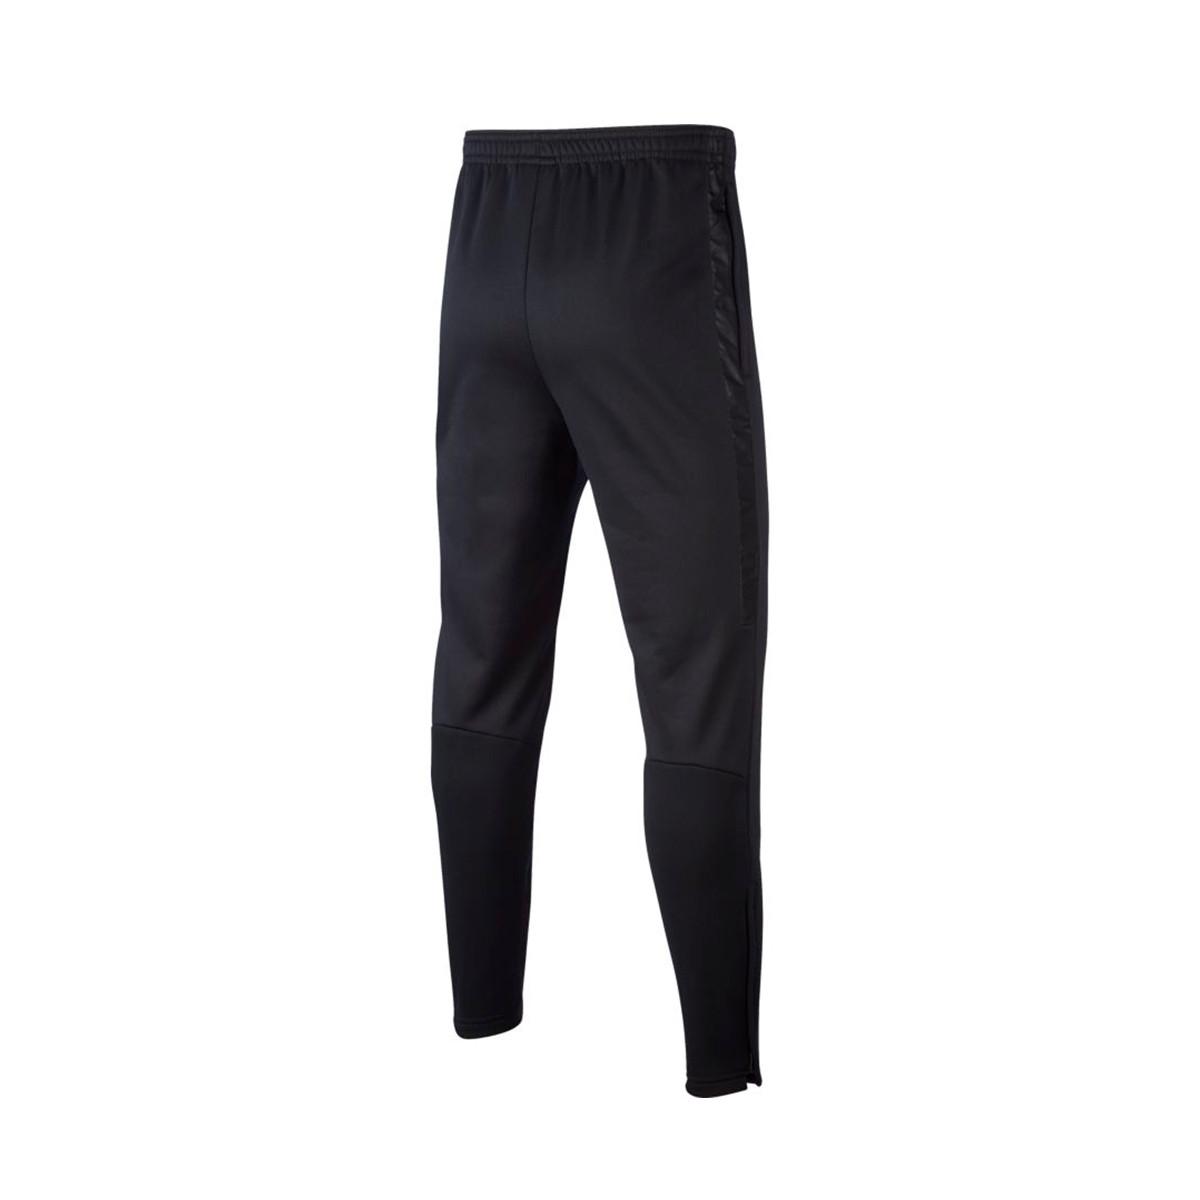 Nike Therma Academy Niño Long pants